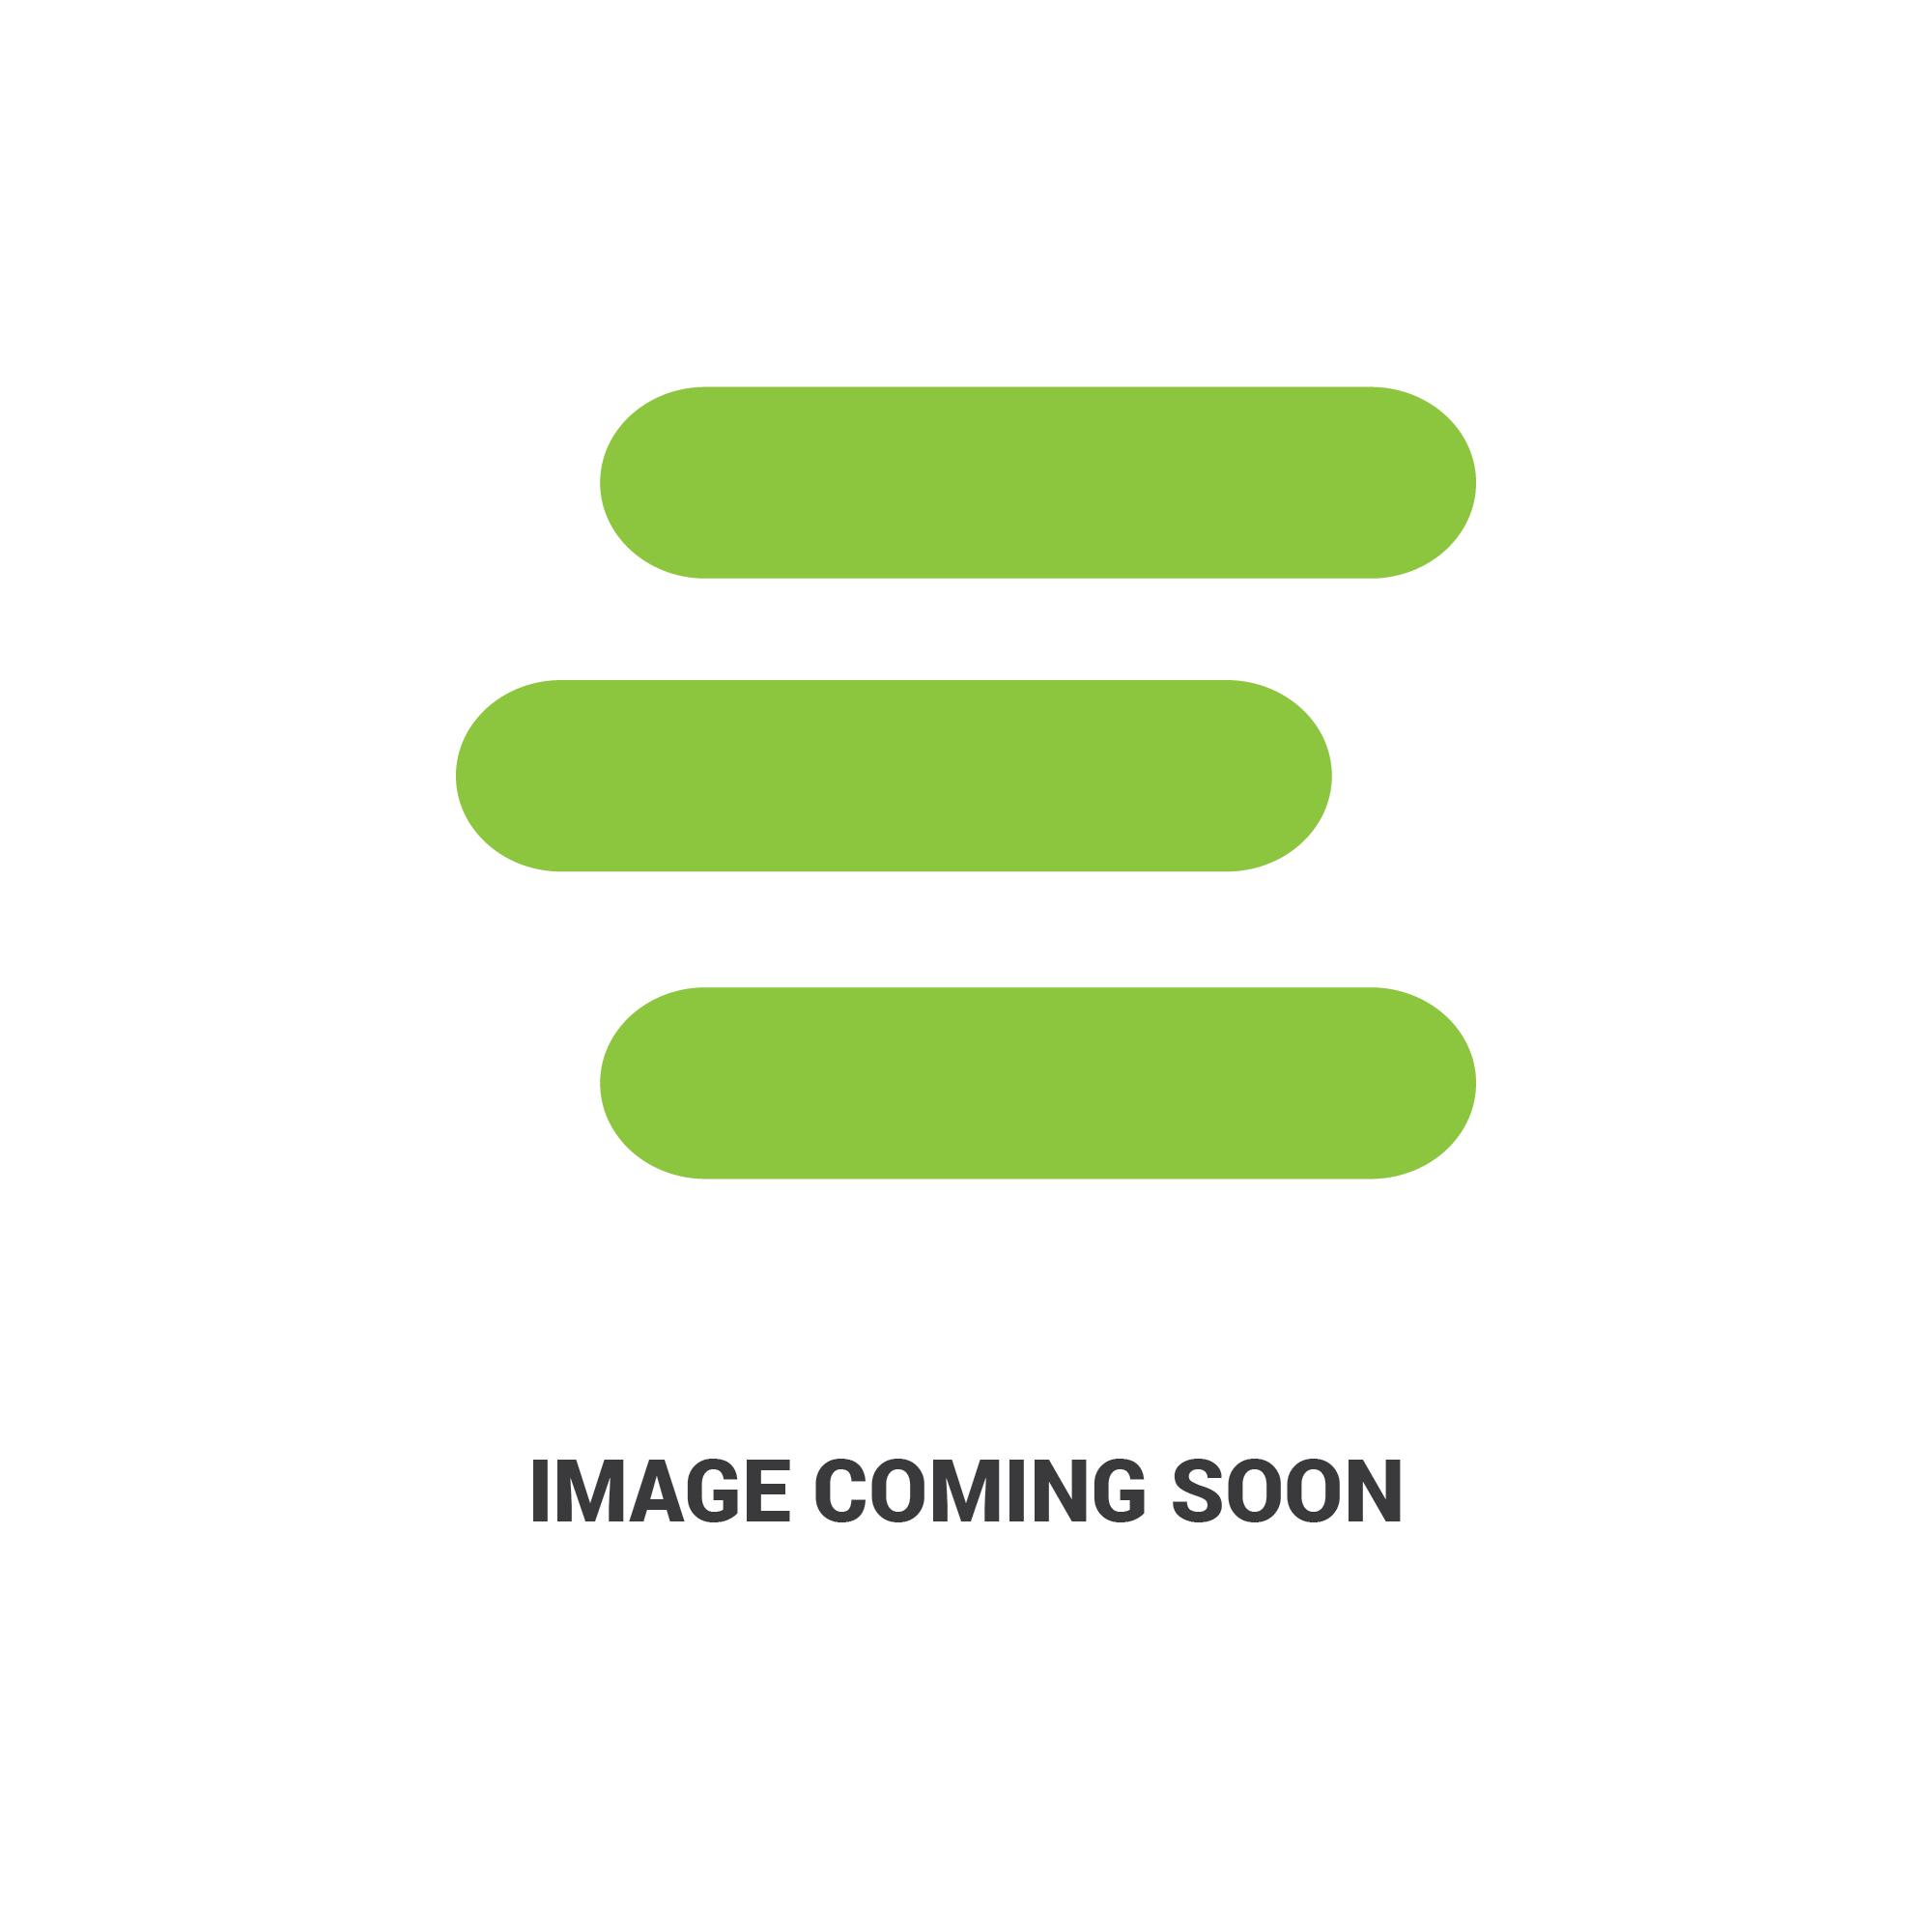 E-7100840edit 1.jpg